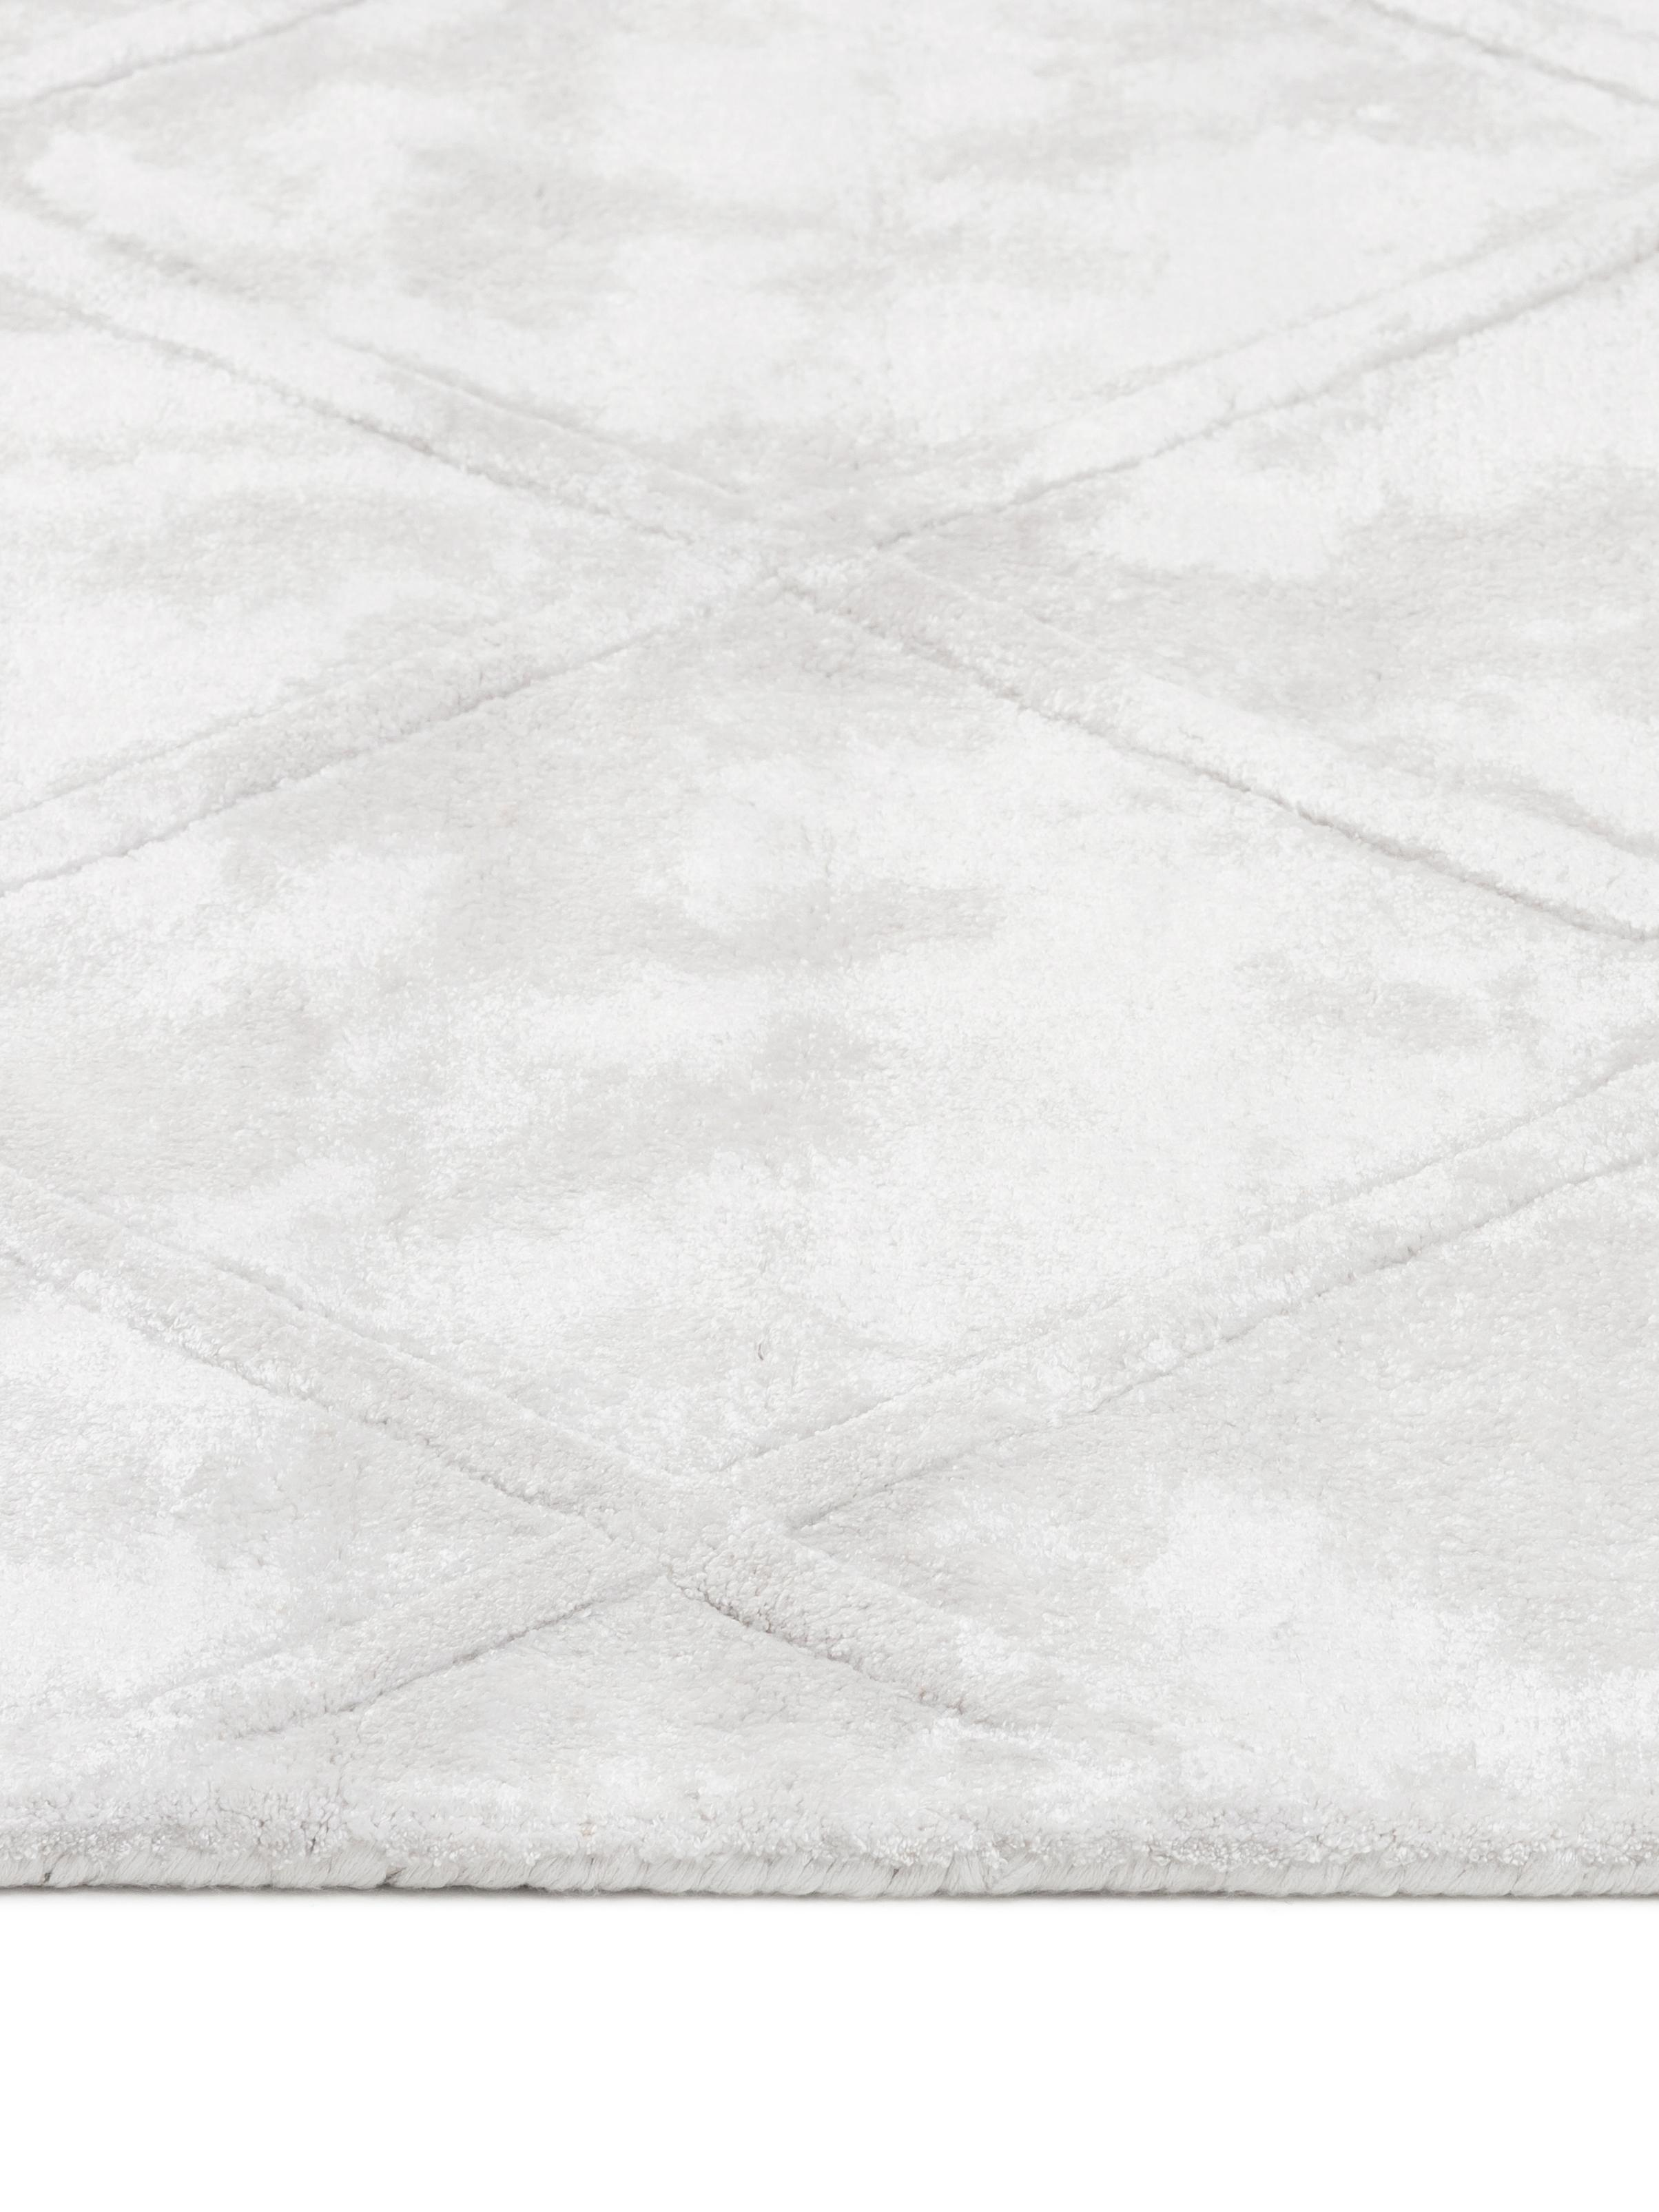 Alfombra artesanal de viscosa Madeleine, Parte superior: 100%viscosa, Reverso: 100%algodón, Crema, An 120 x L 180 cm (Tamaño S)